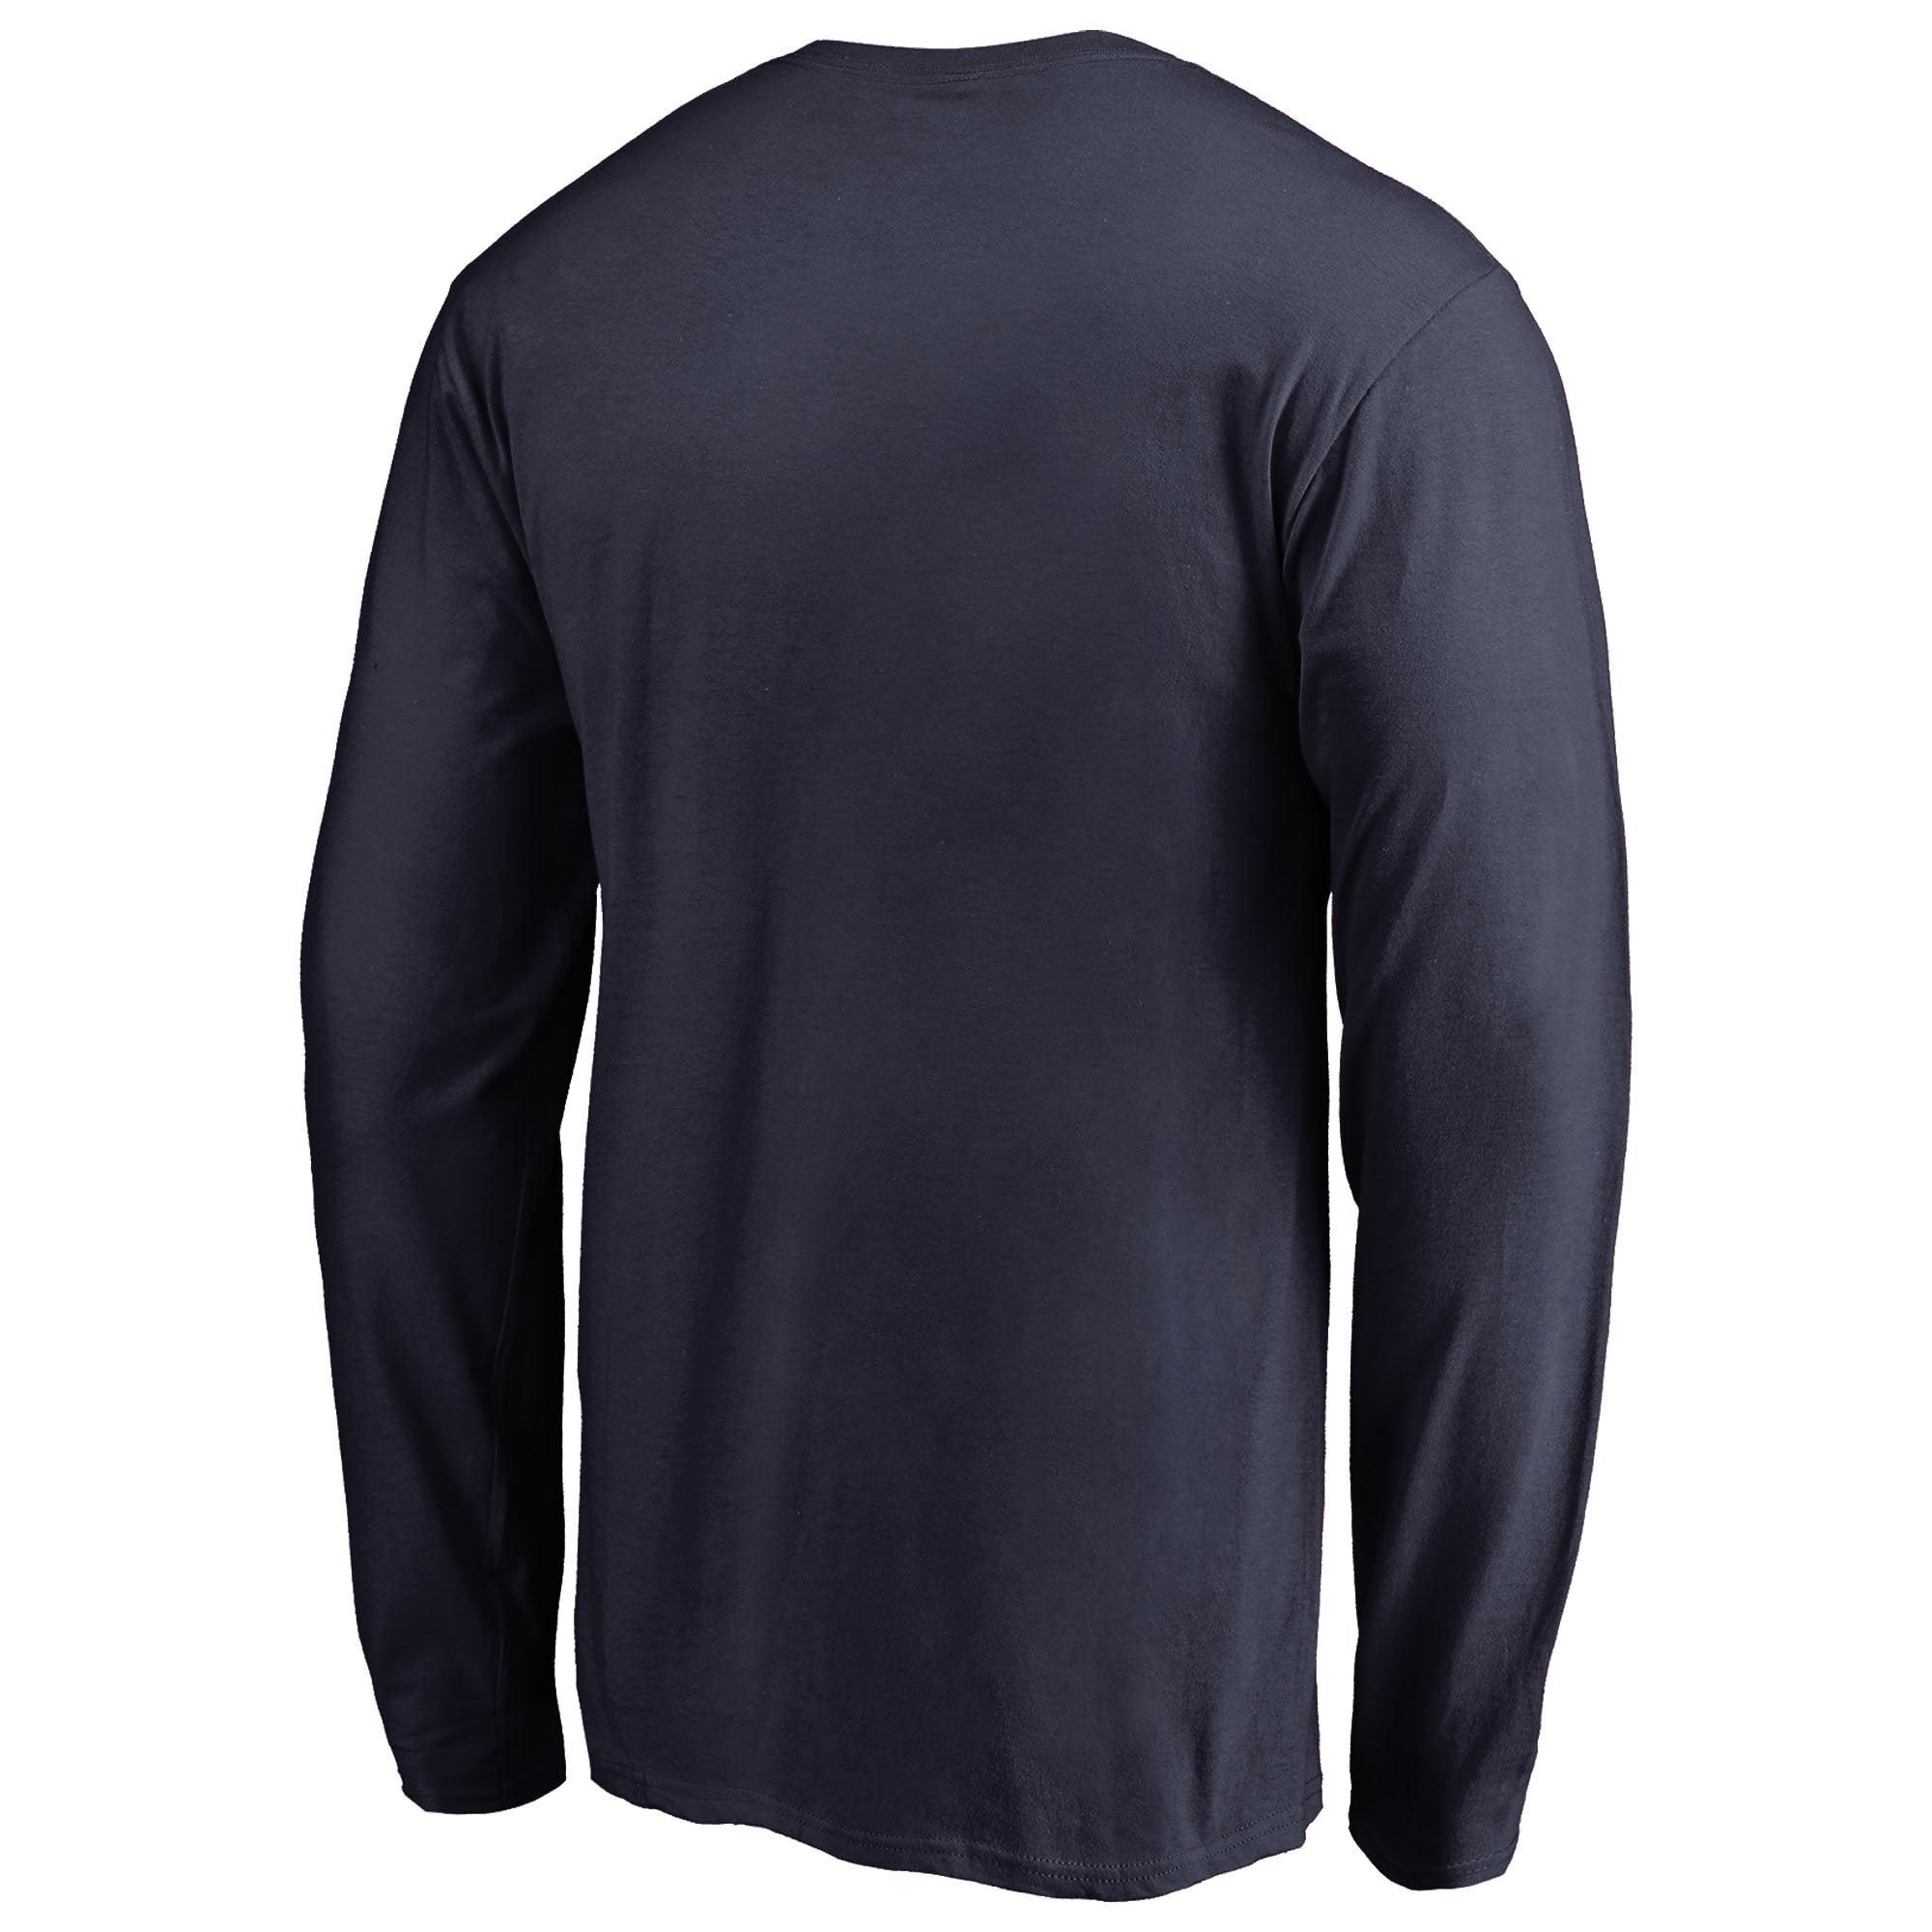 san francisco ad30c 43d34 Philadelphia Union Fanatics Branded We Are Long Sleeve T-Shirt - Navy